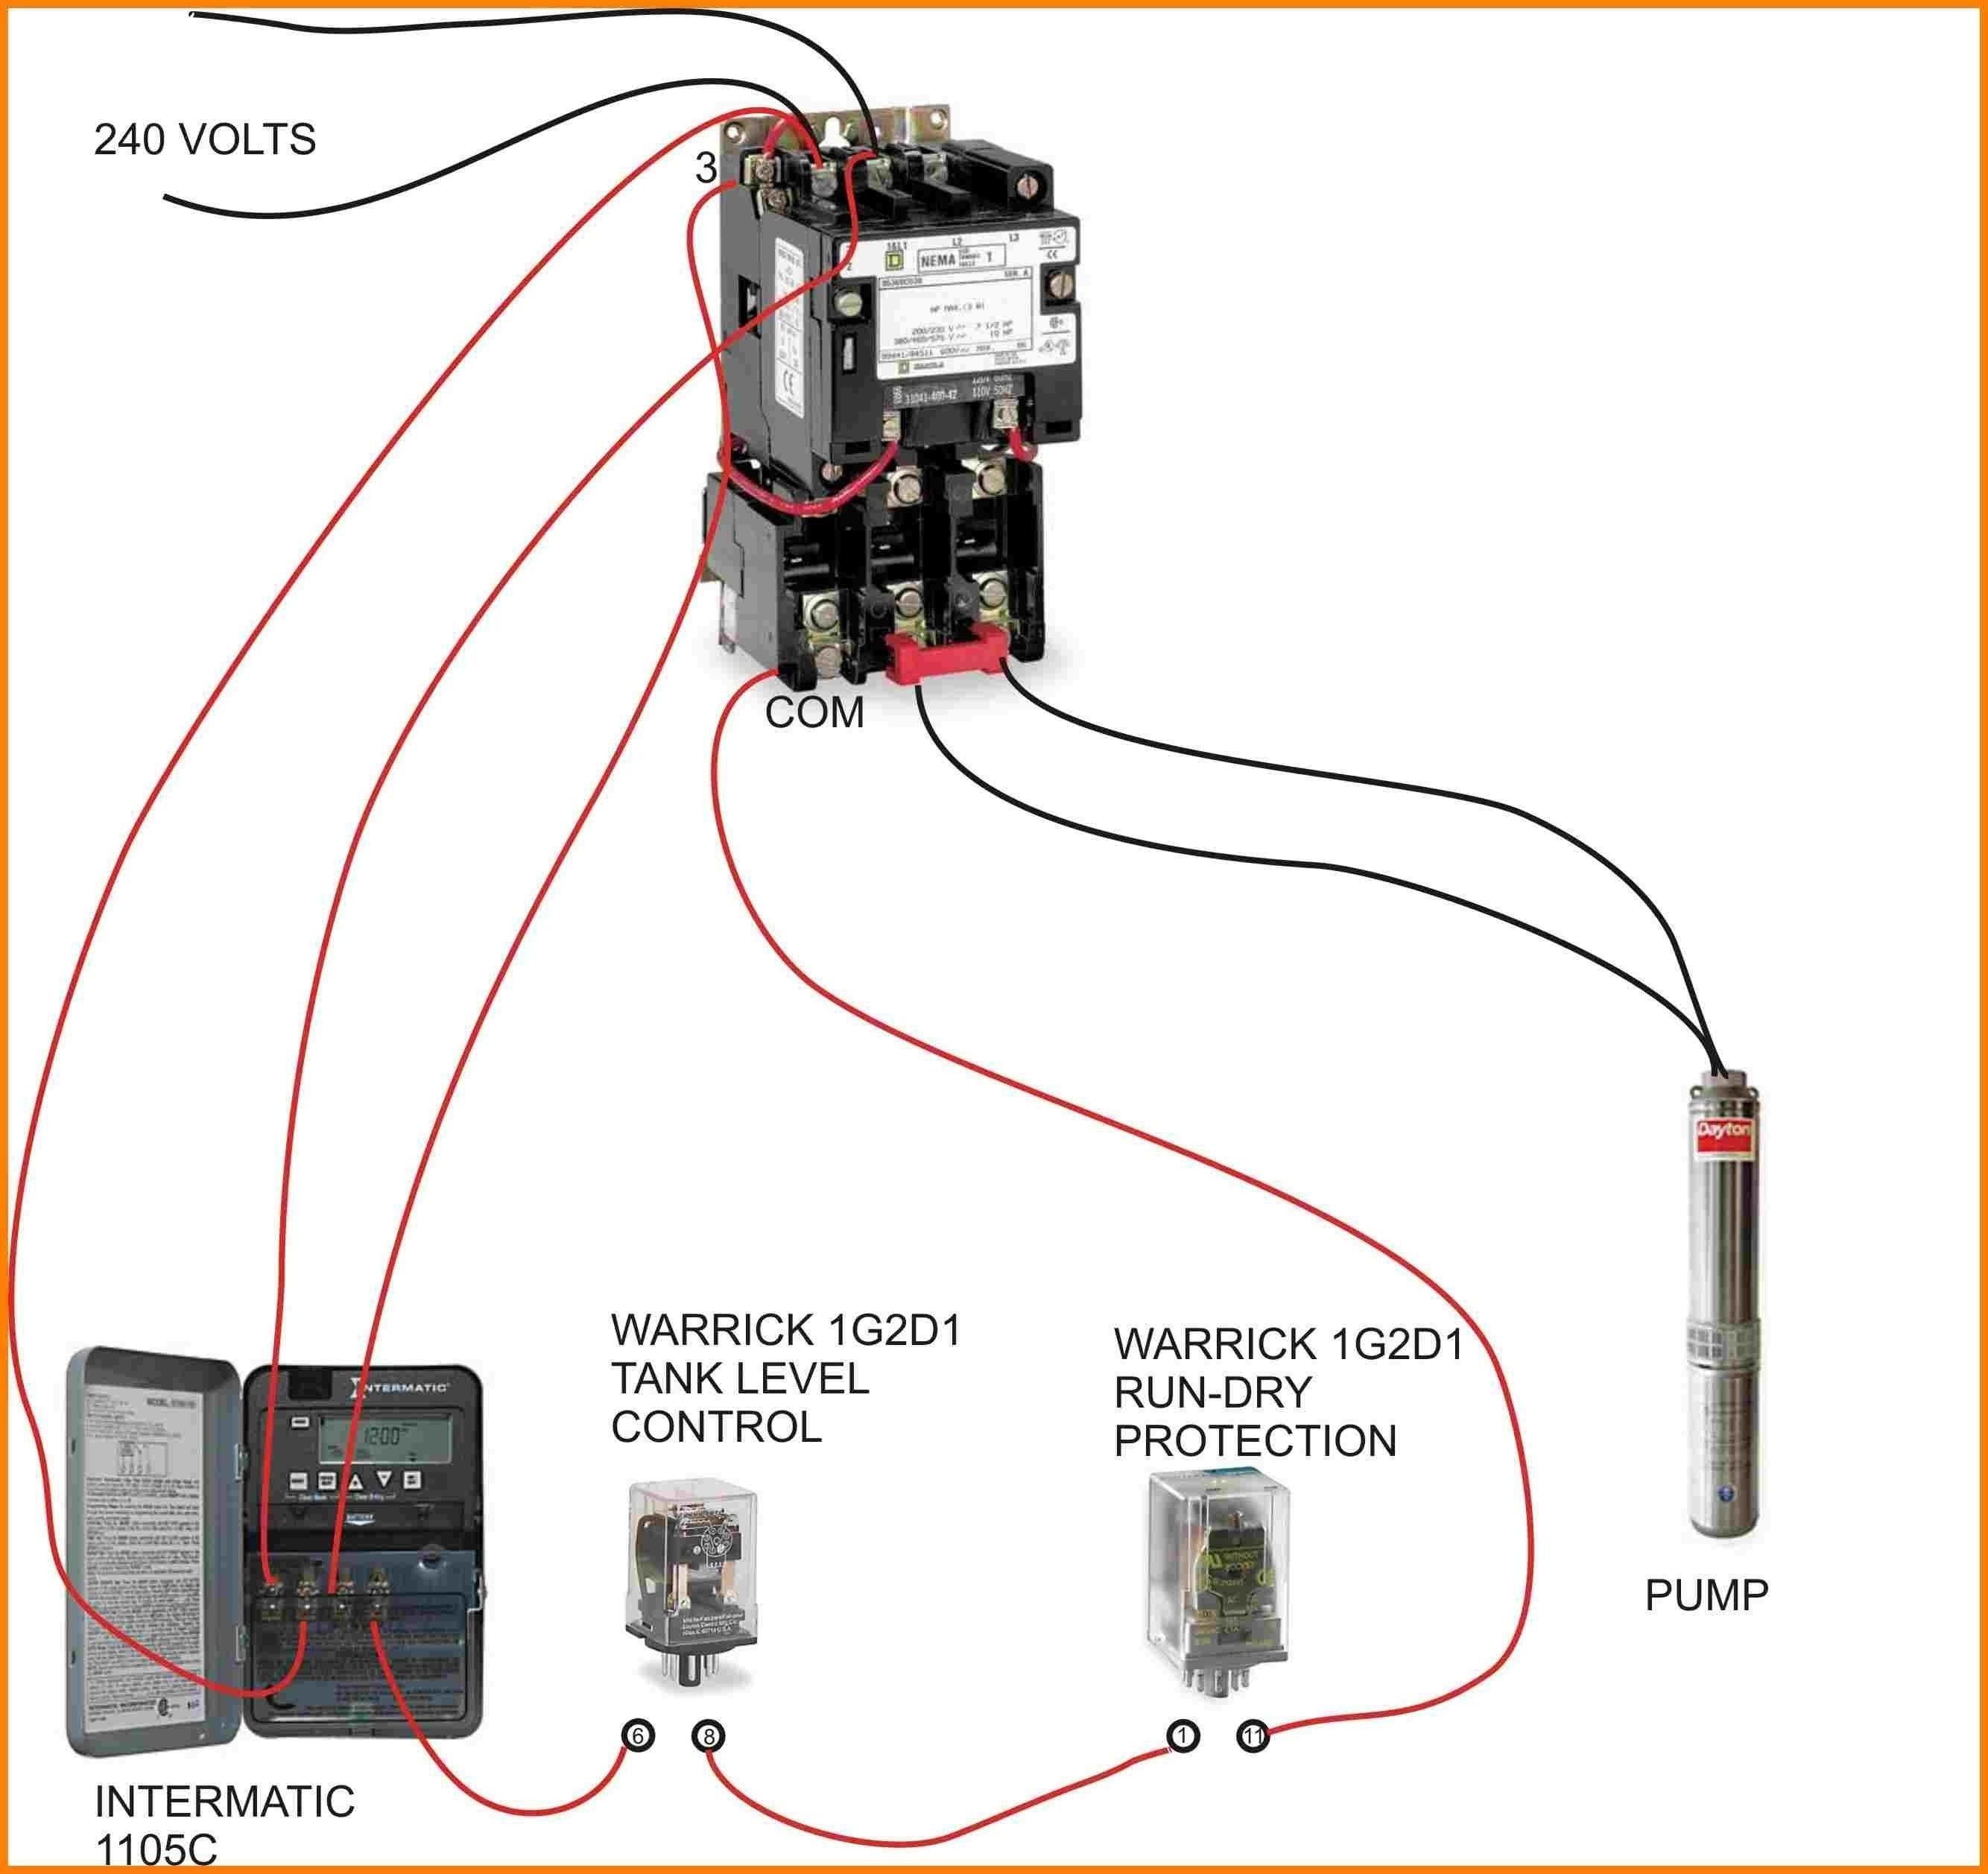 Unique Wiring Diagram For Car Capacitor Well Pump Irrigation Pumps Pumps